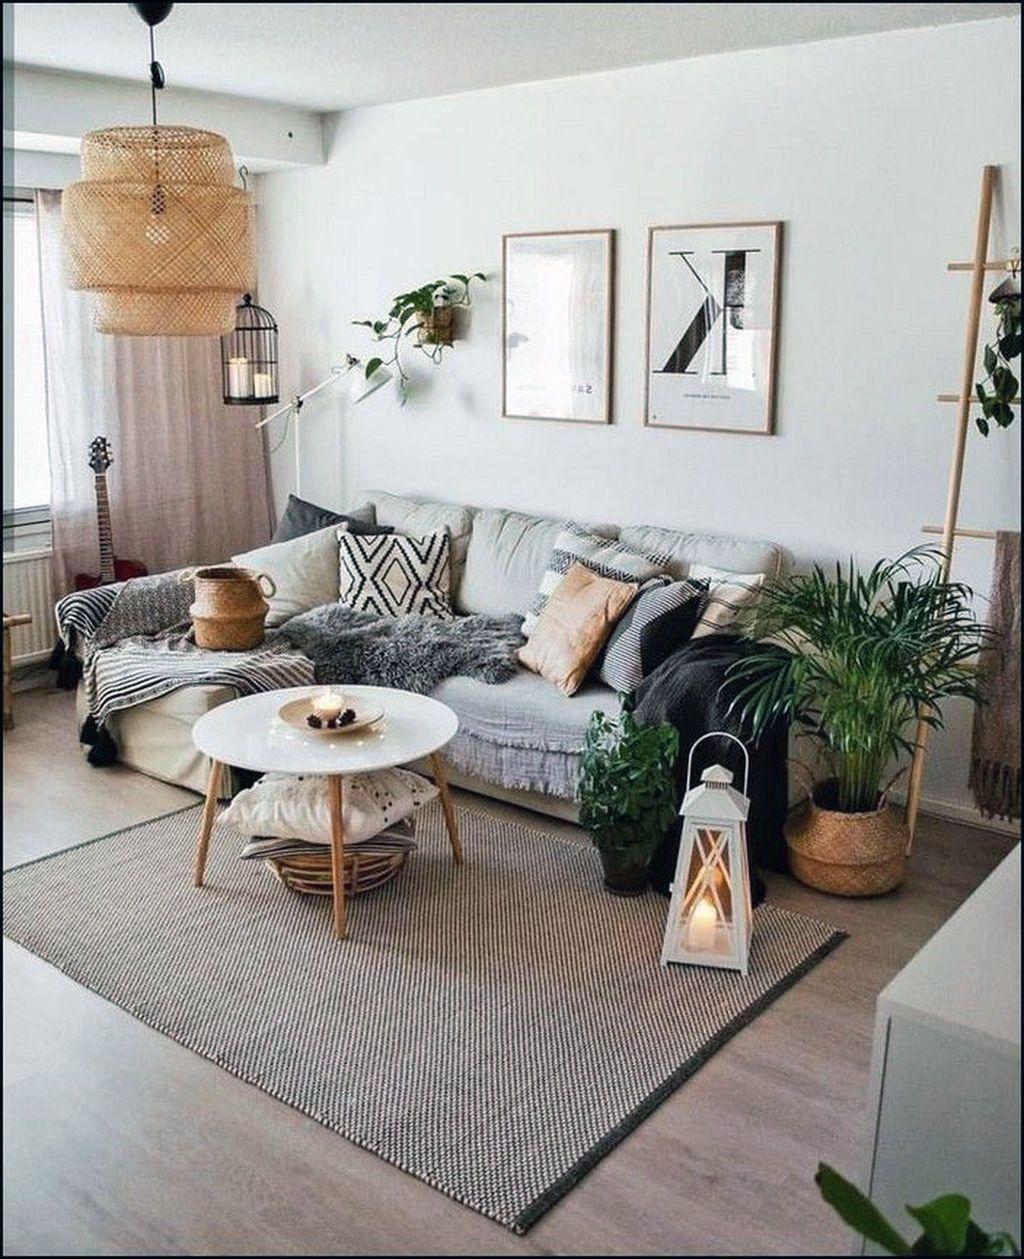 28 Marvelous Scandinavian Living Rooms With Boho Style Ideas Living Room Scandinavian Luxury Dining Room Decor Warm Home Decor Home decor ideas living room